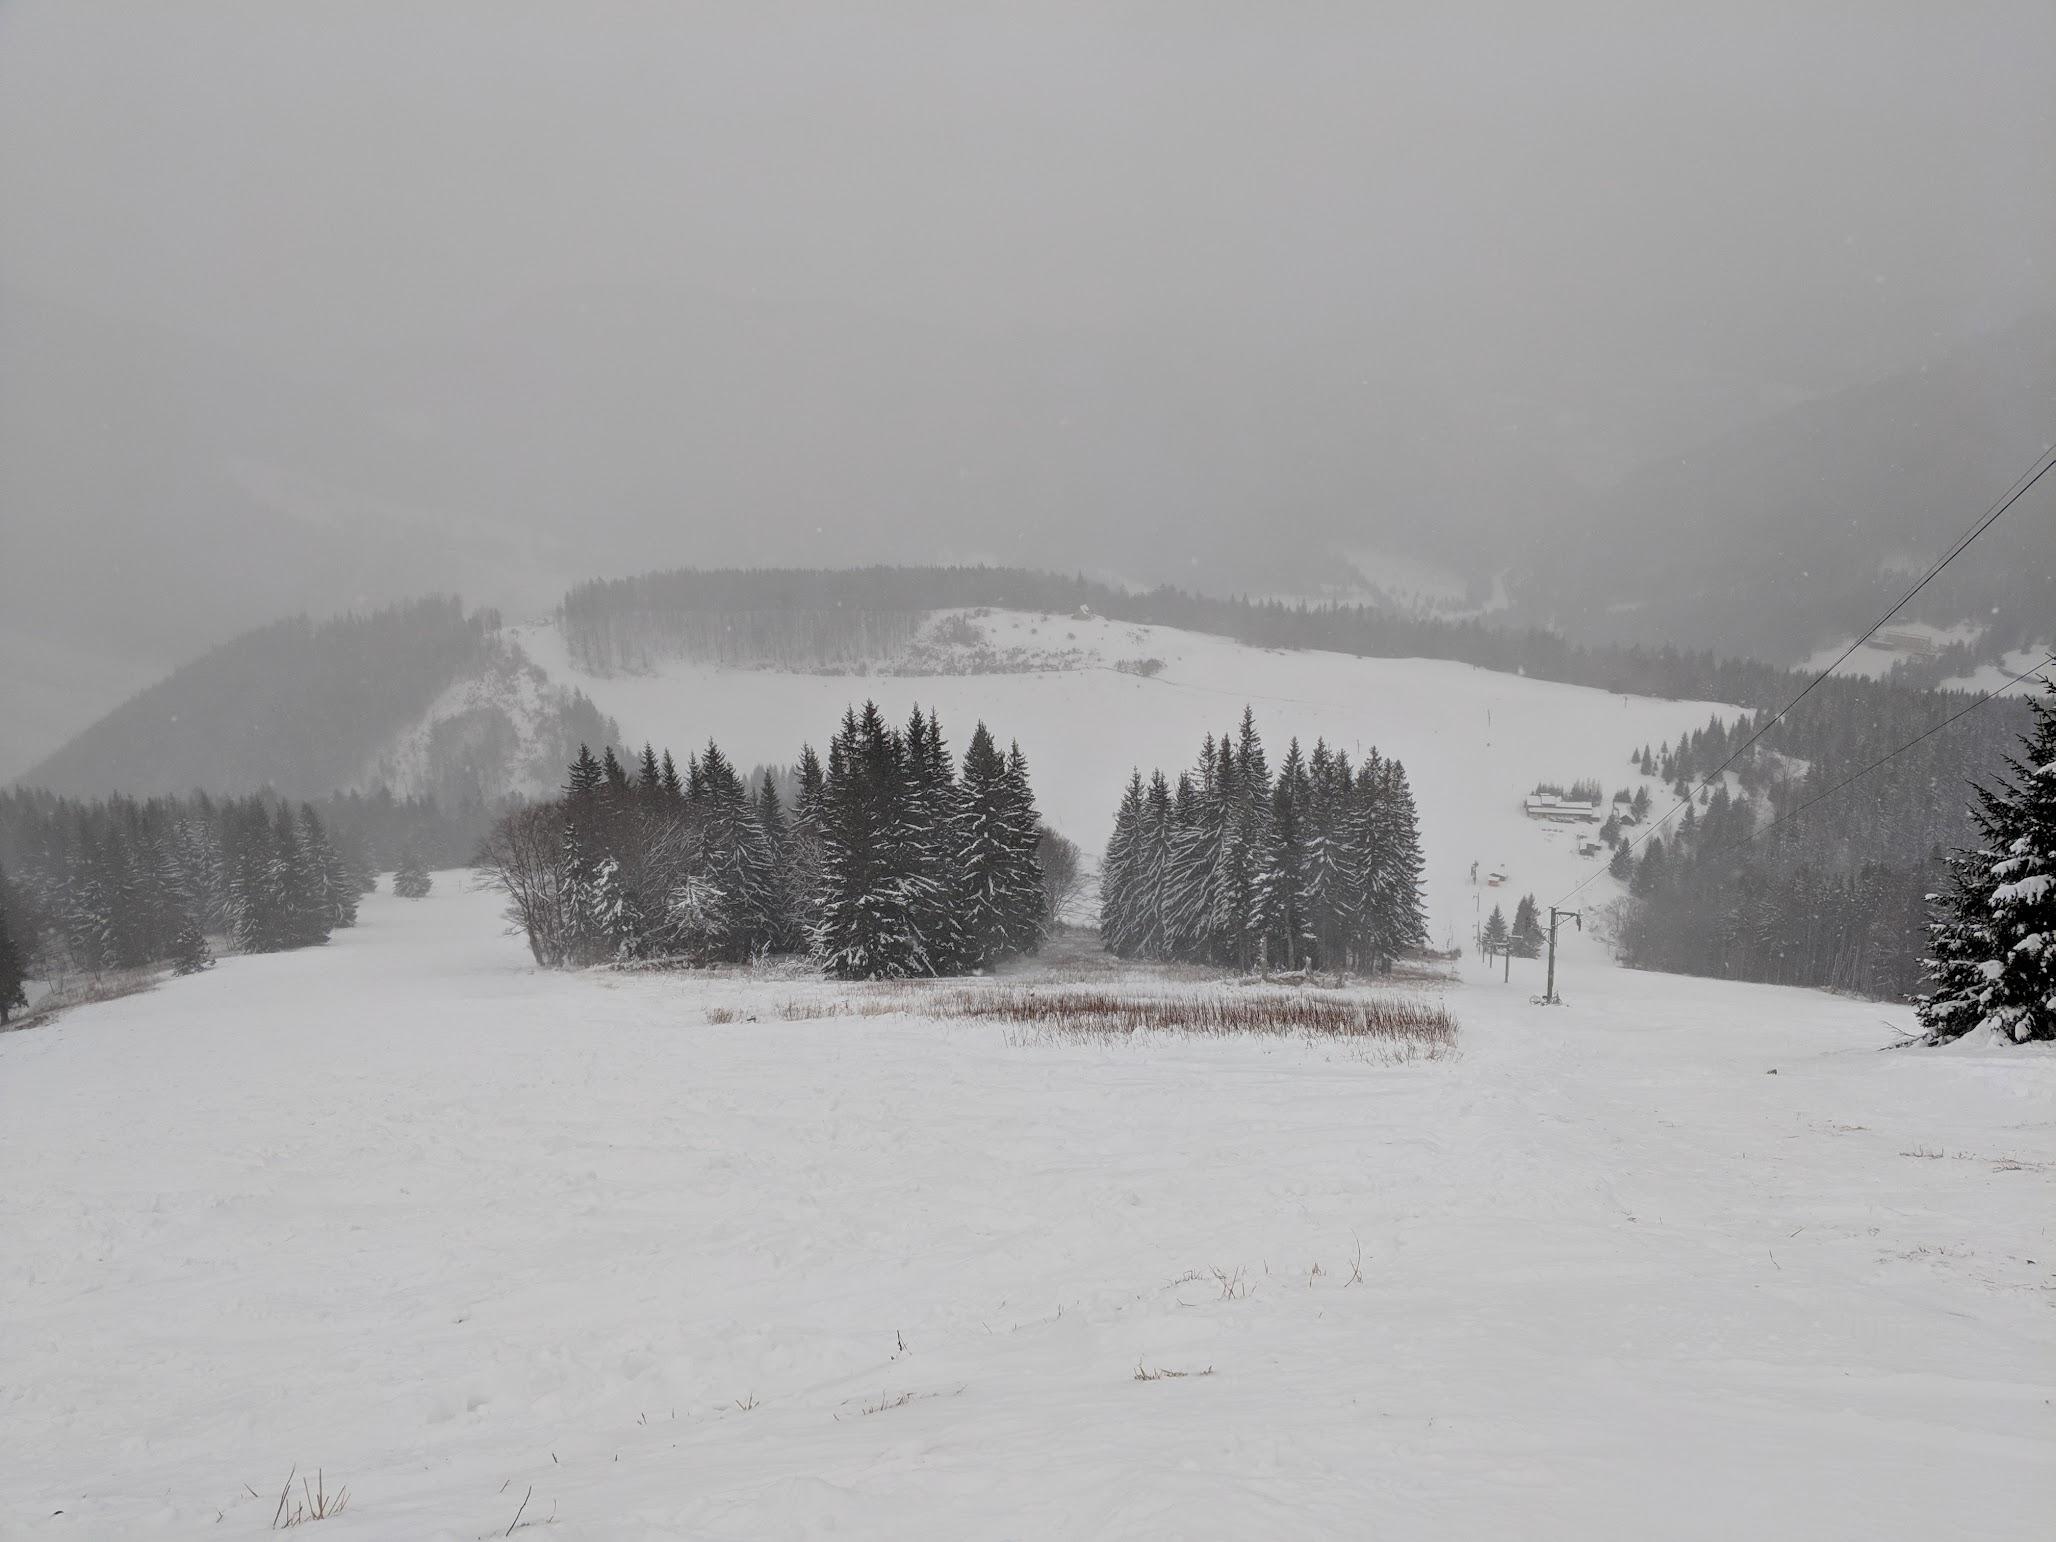 Vratna Poludnovy grun skitour (Slovakia) - Dec 18